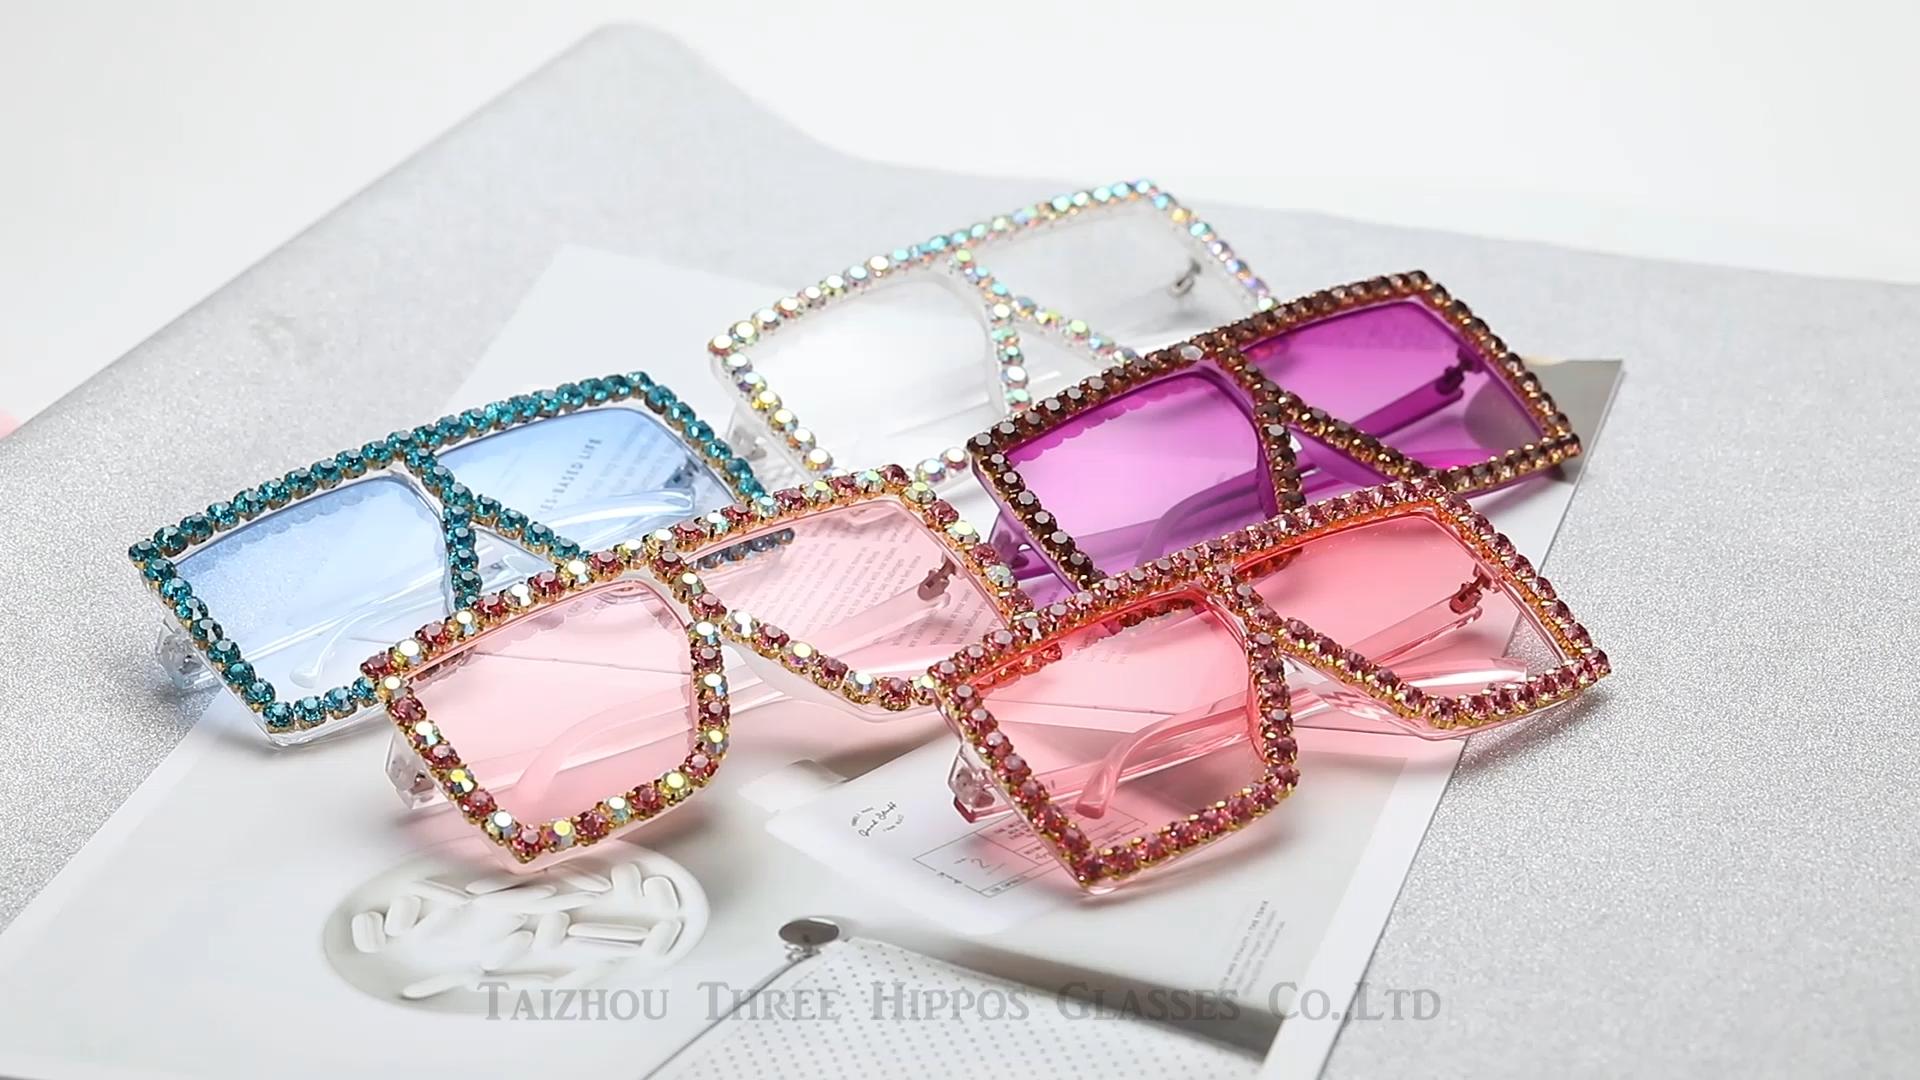 THREE HIPPOS New Arrivals Diamond Sunglasses  Fashionable Square Rhinestones Shades Oversize Beautiful Handmade Sun Glasses